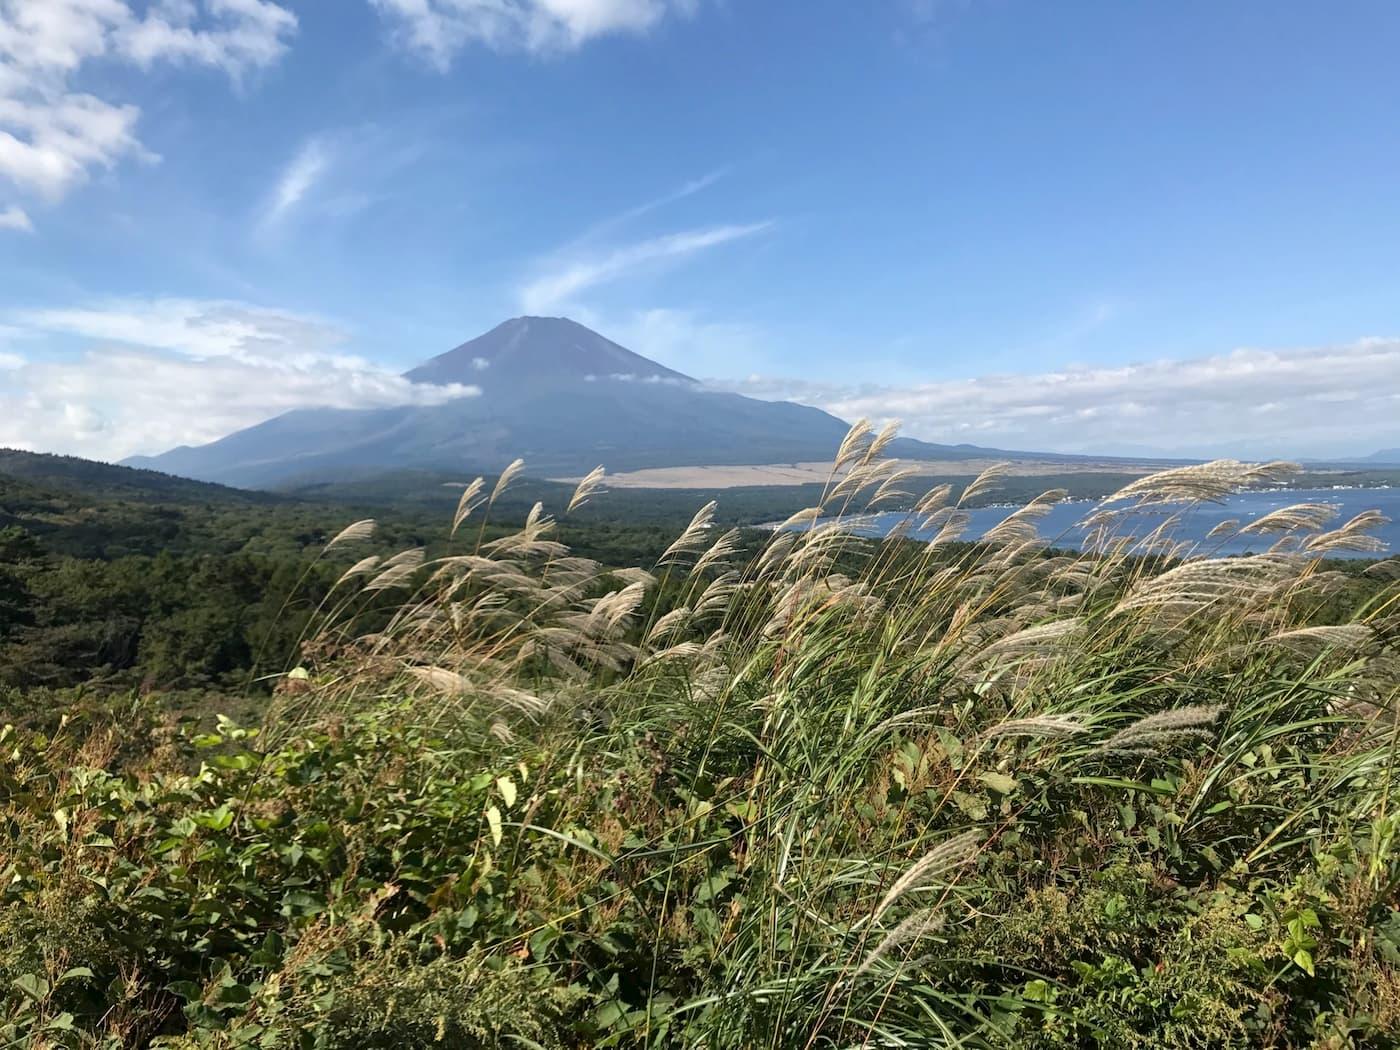 EKIDEN for PEACE2020 富士山・山中湖 チャリティ駅伝 | 山梨(山中湖交流プラザきらら)